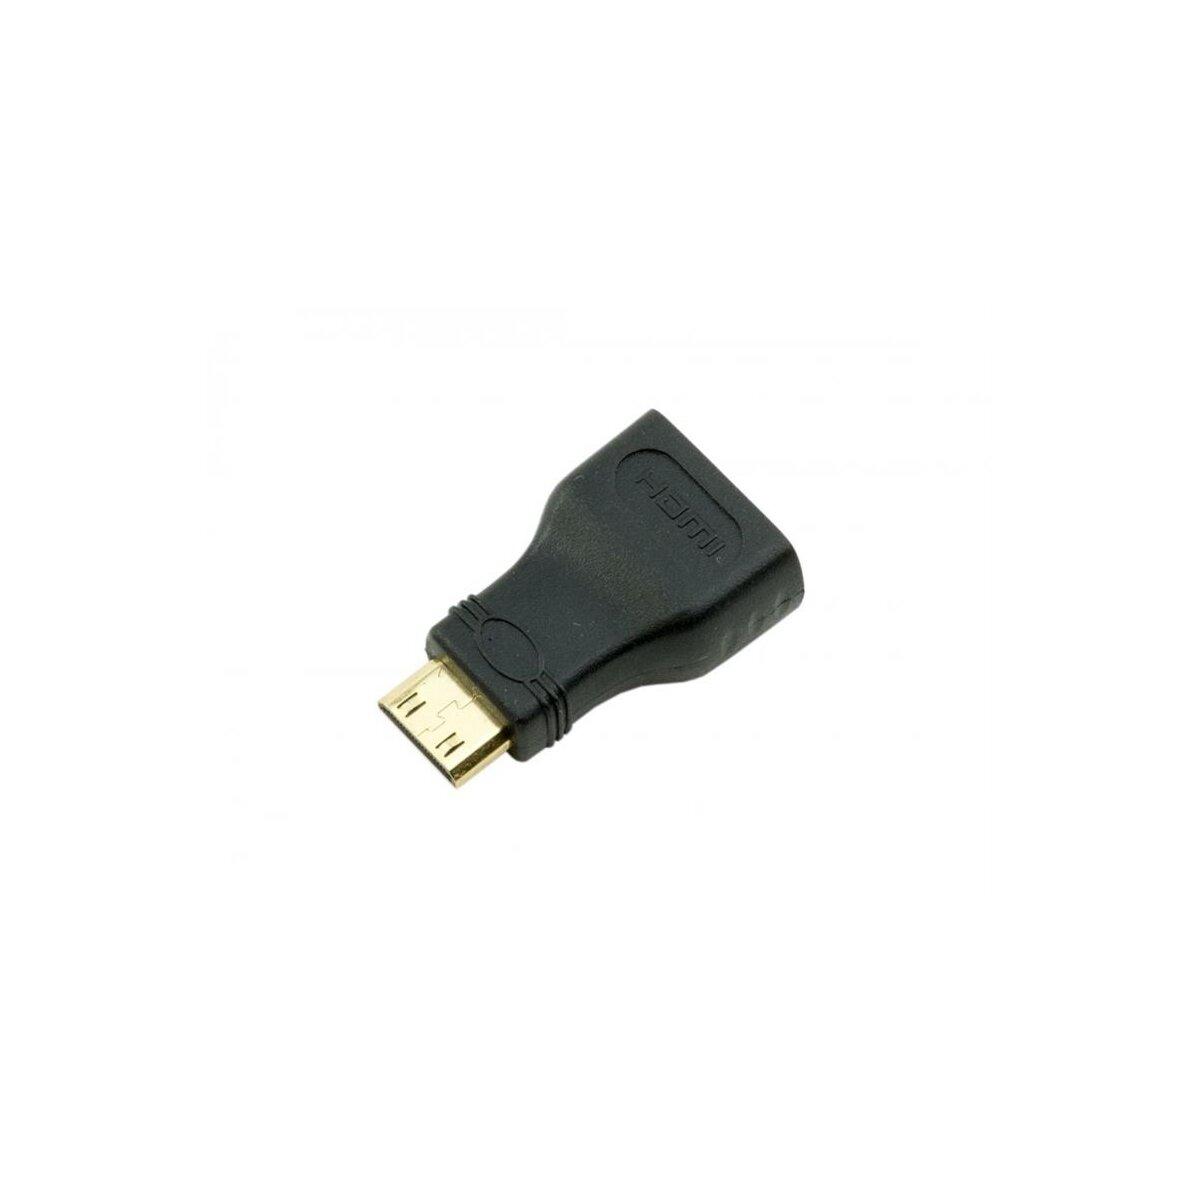 raspberry pi zero hdmi adapter mini stecker auf buchse 2 99. Black Bedroom Furniture Sets. Home Design Ideas